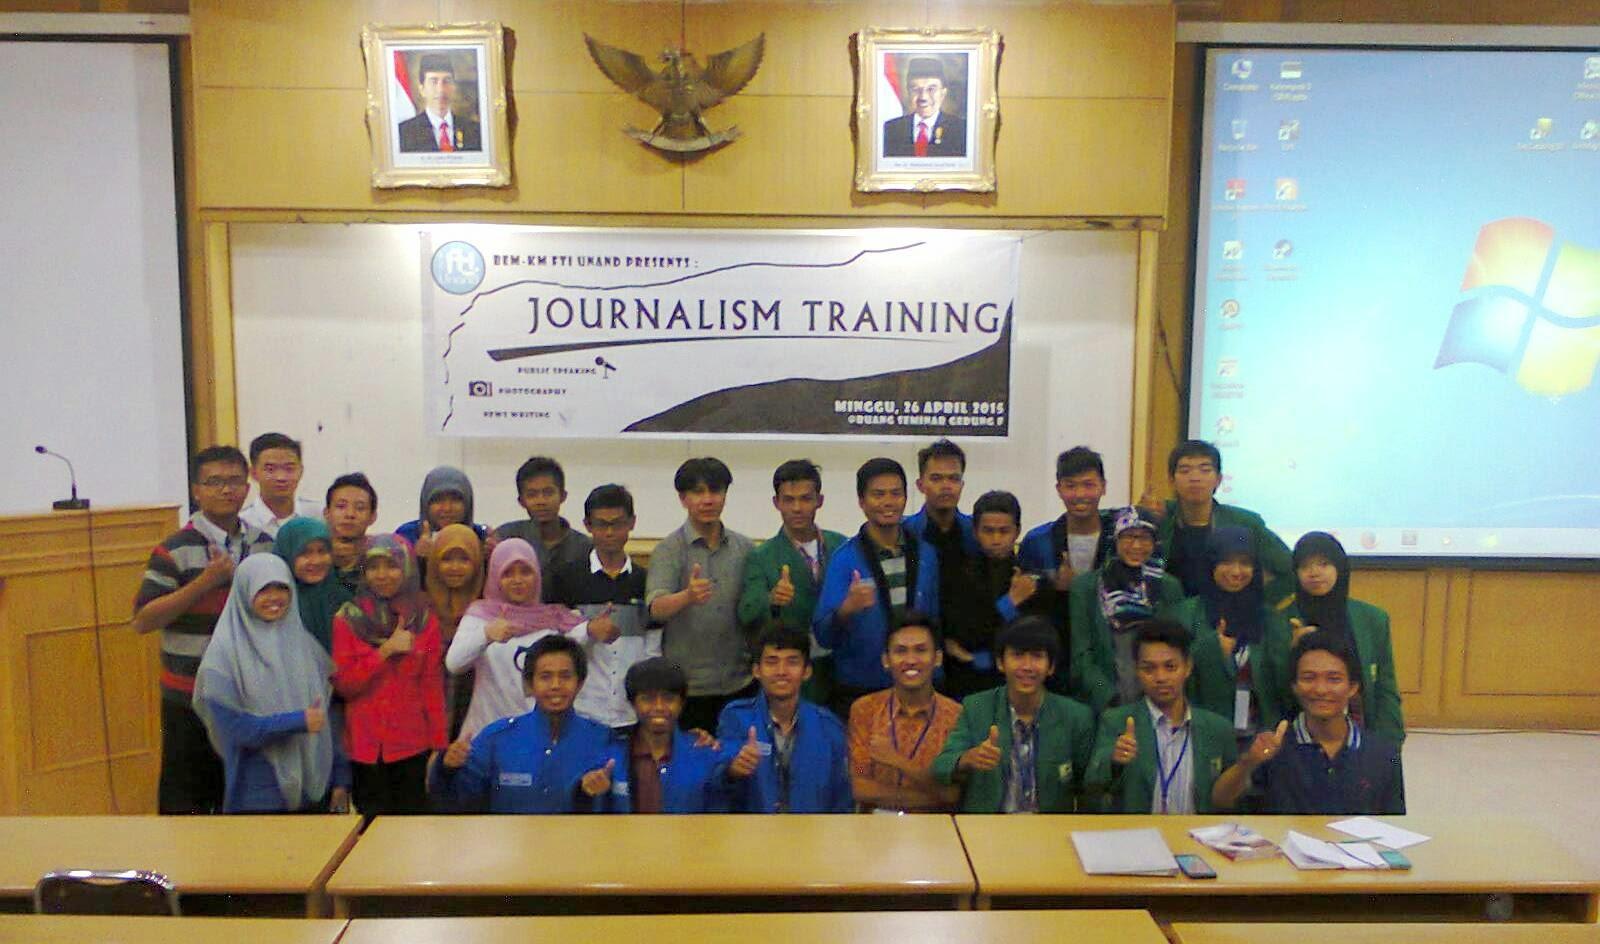 BEM FTI Unand Gelar Pelatihan Jurnalistik